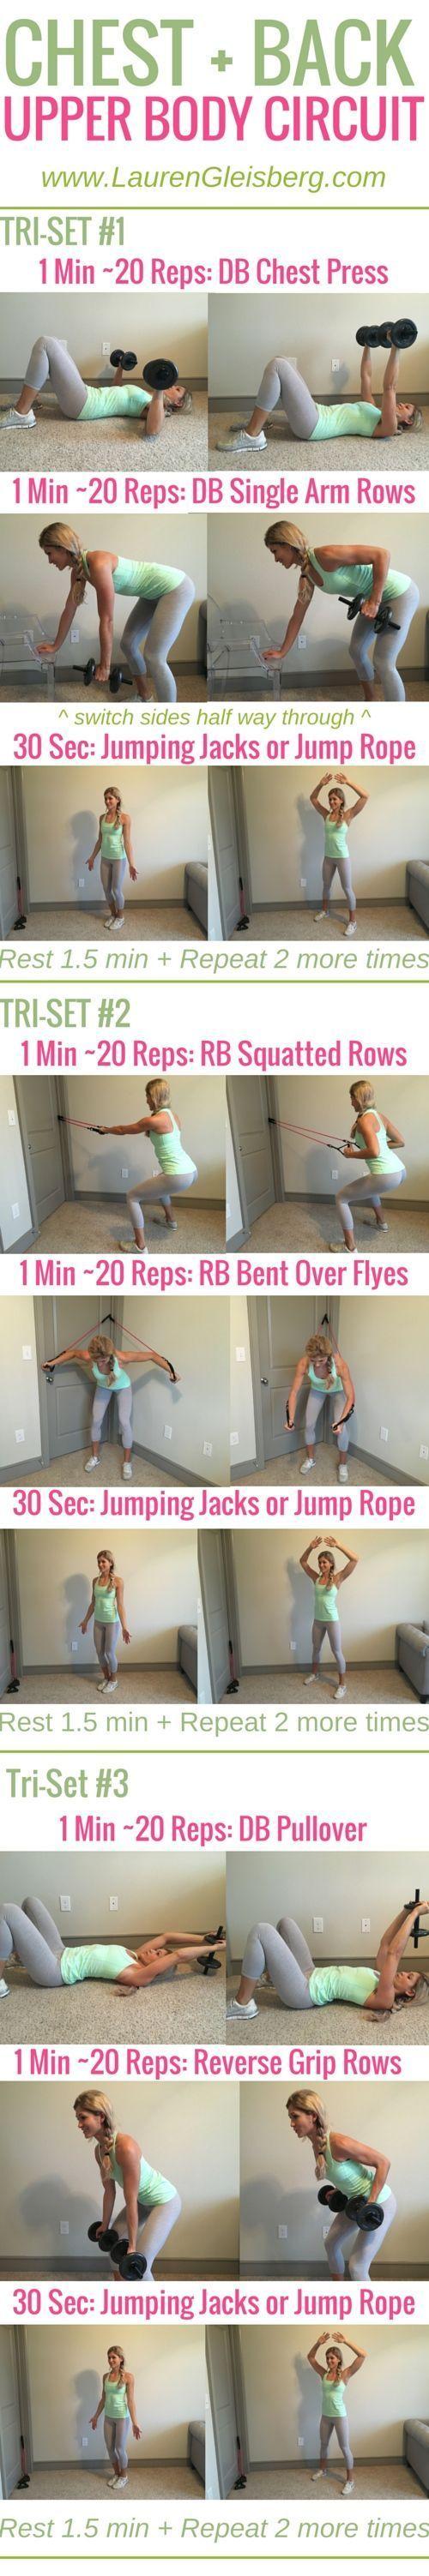 Week 2 Day 5 | Home Version | Chest + Back Upper Body Circuit | #LGFitmas Lauren Gleisberg